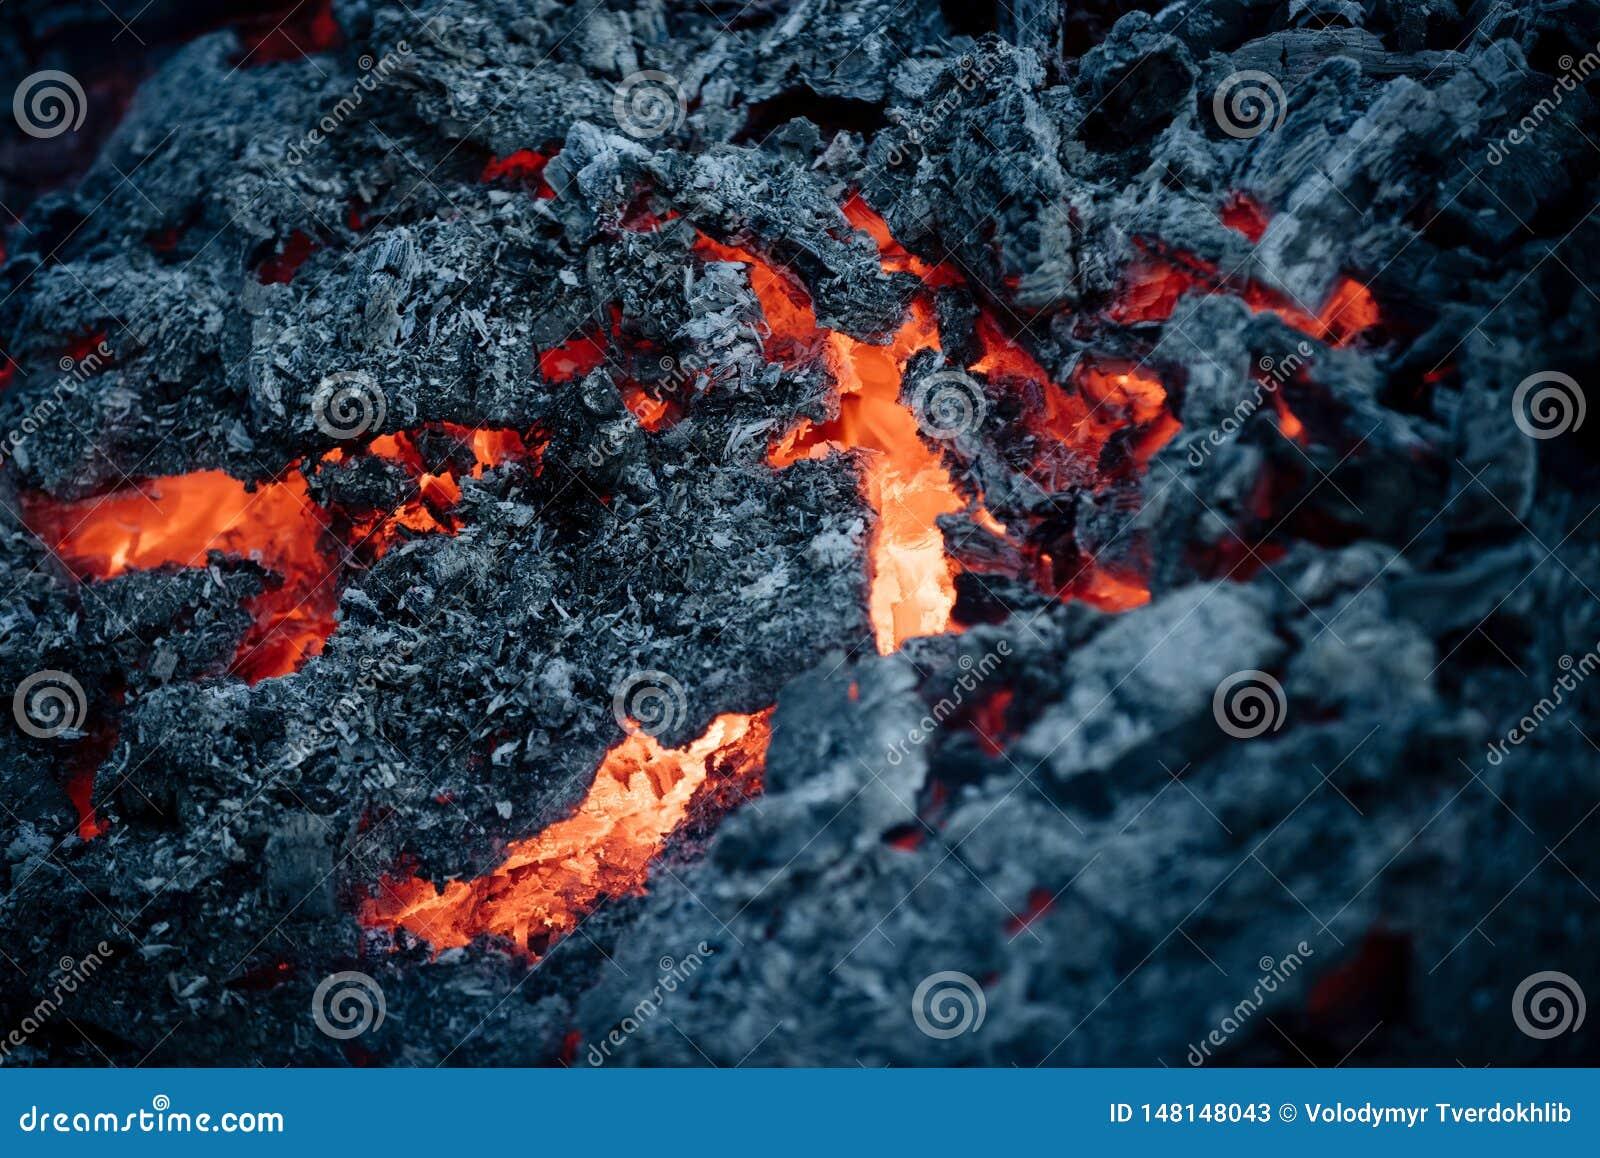 Lava flame on black ash background